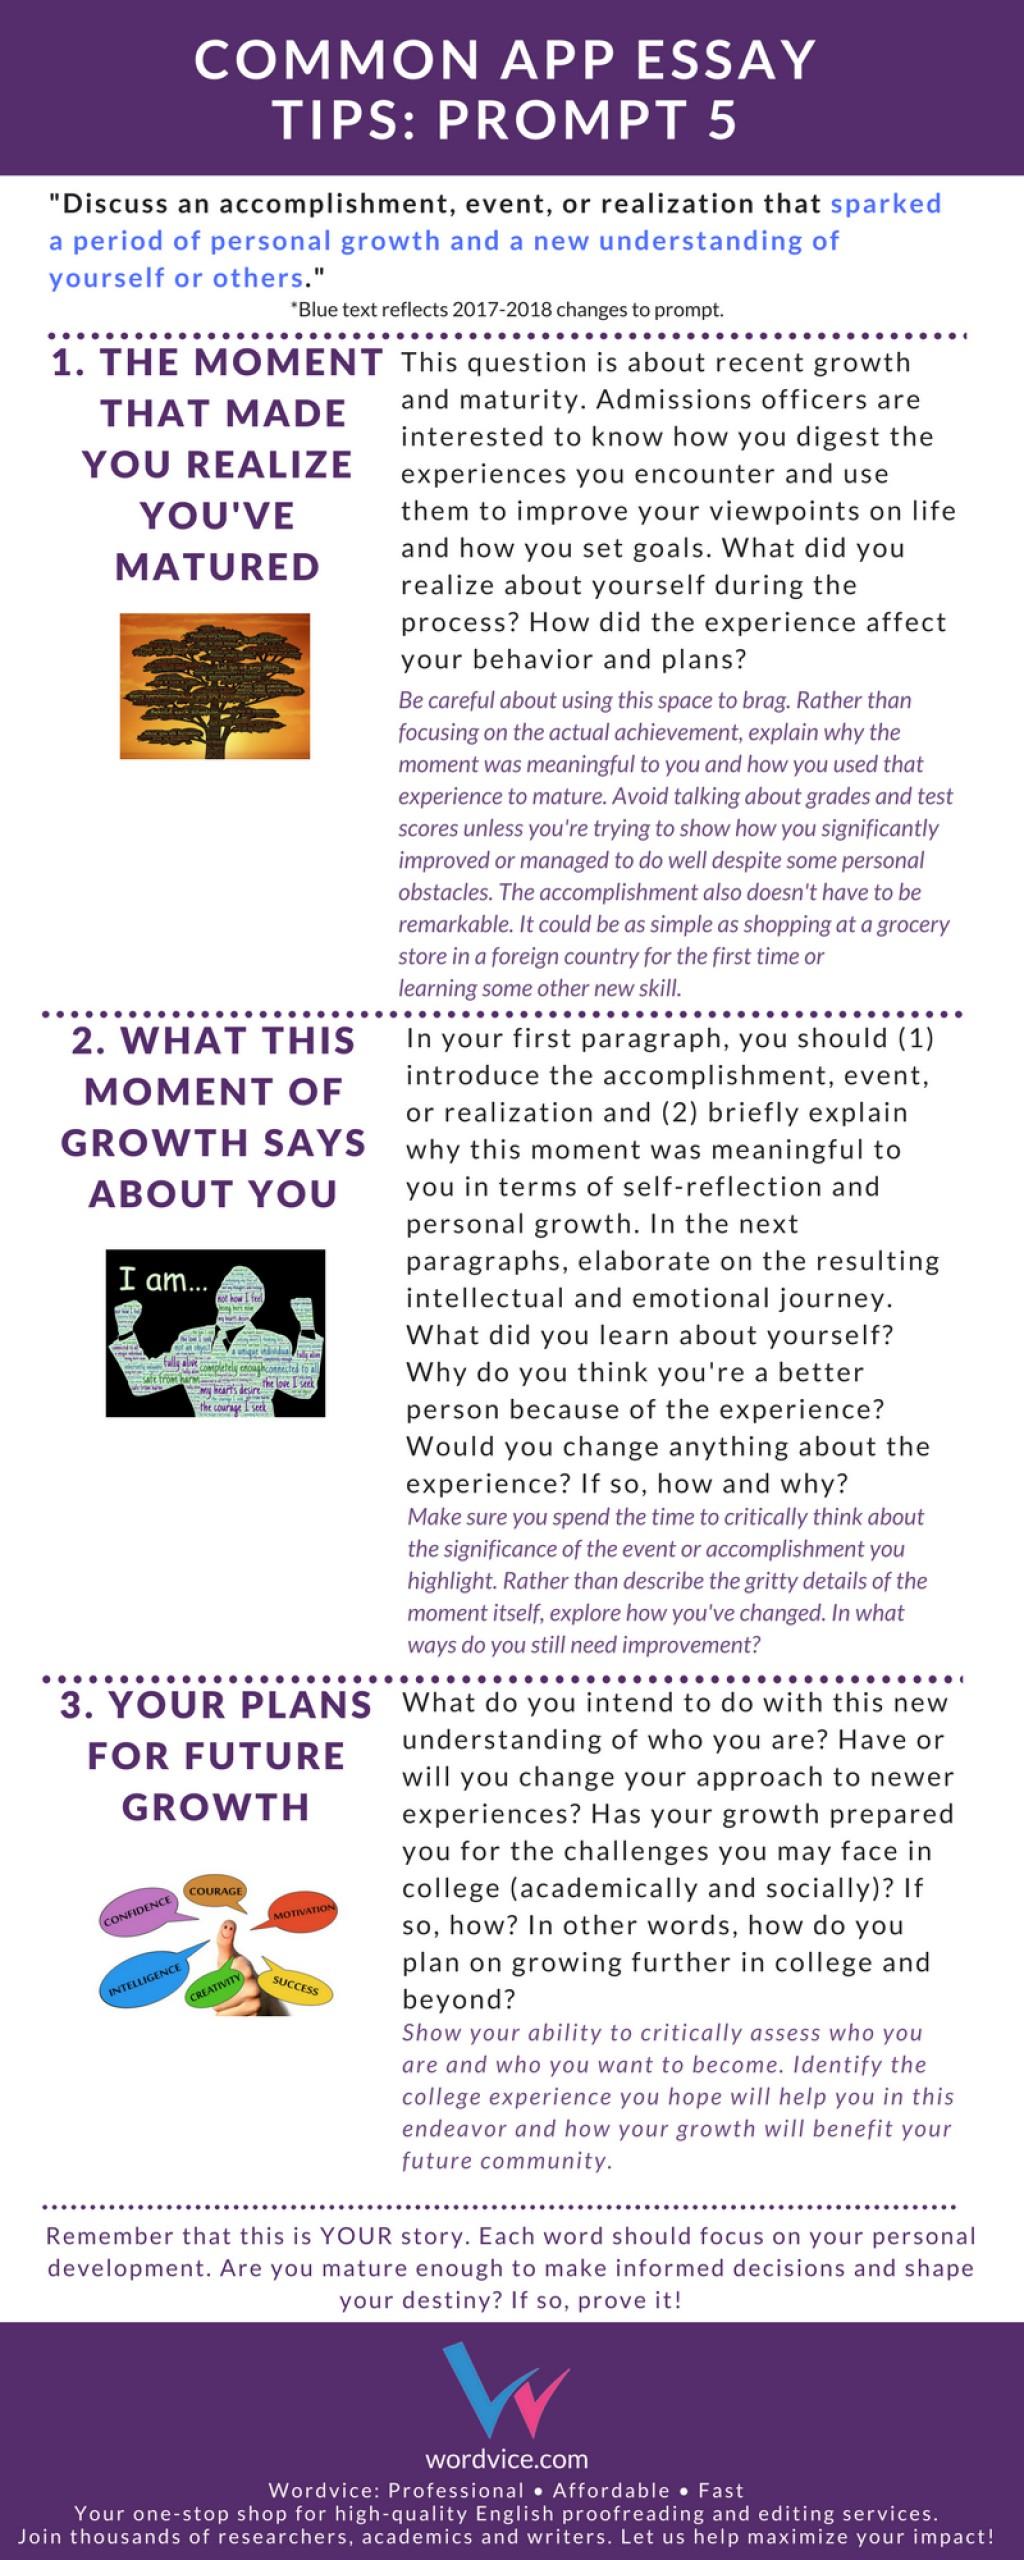 017 Common App Brainstormprompt Essay Prompt Unusual Prompts Usc Examples 1 4 Large